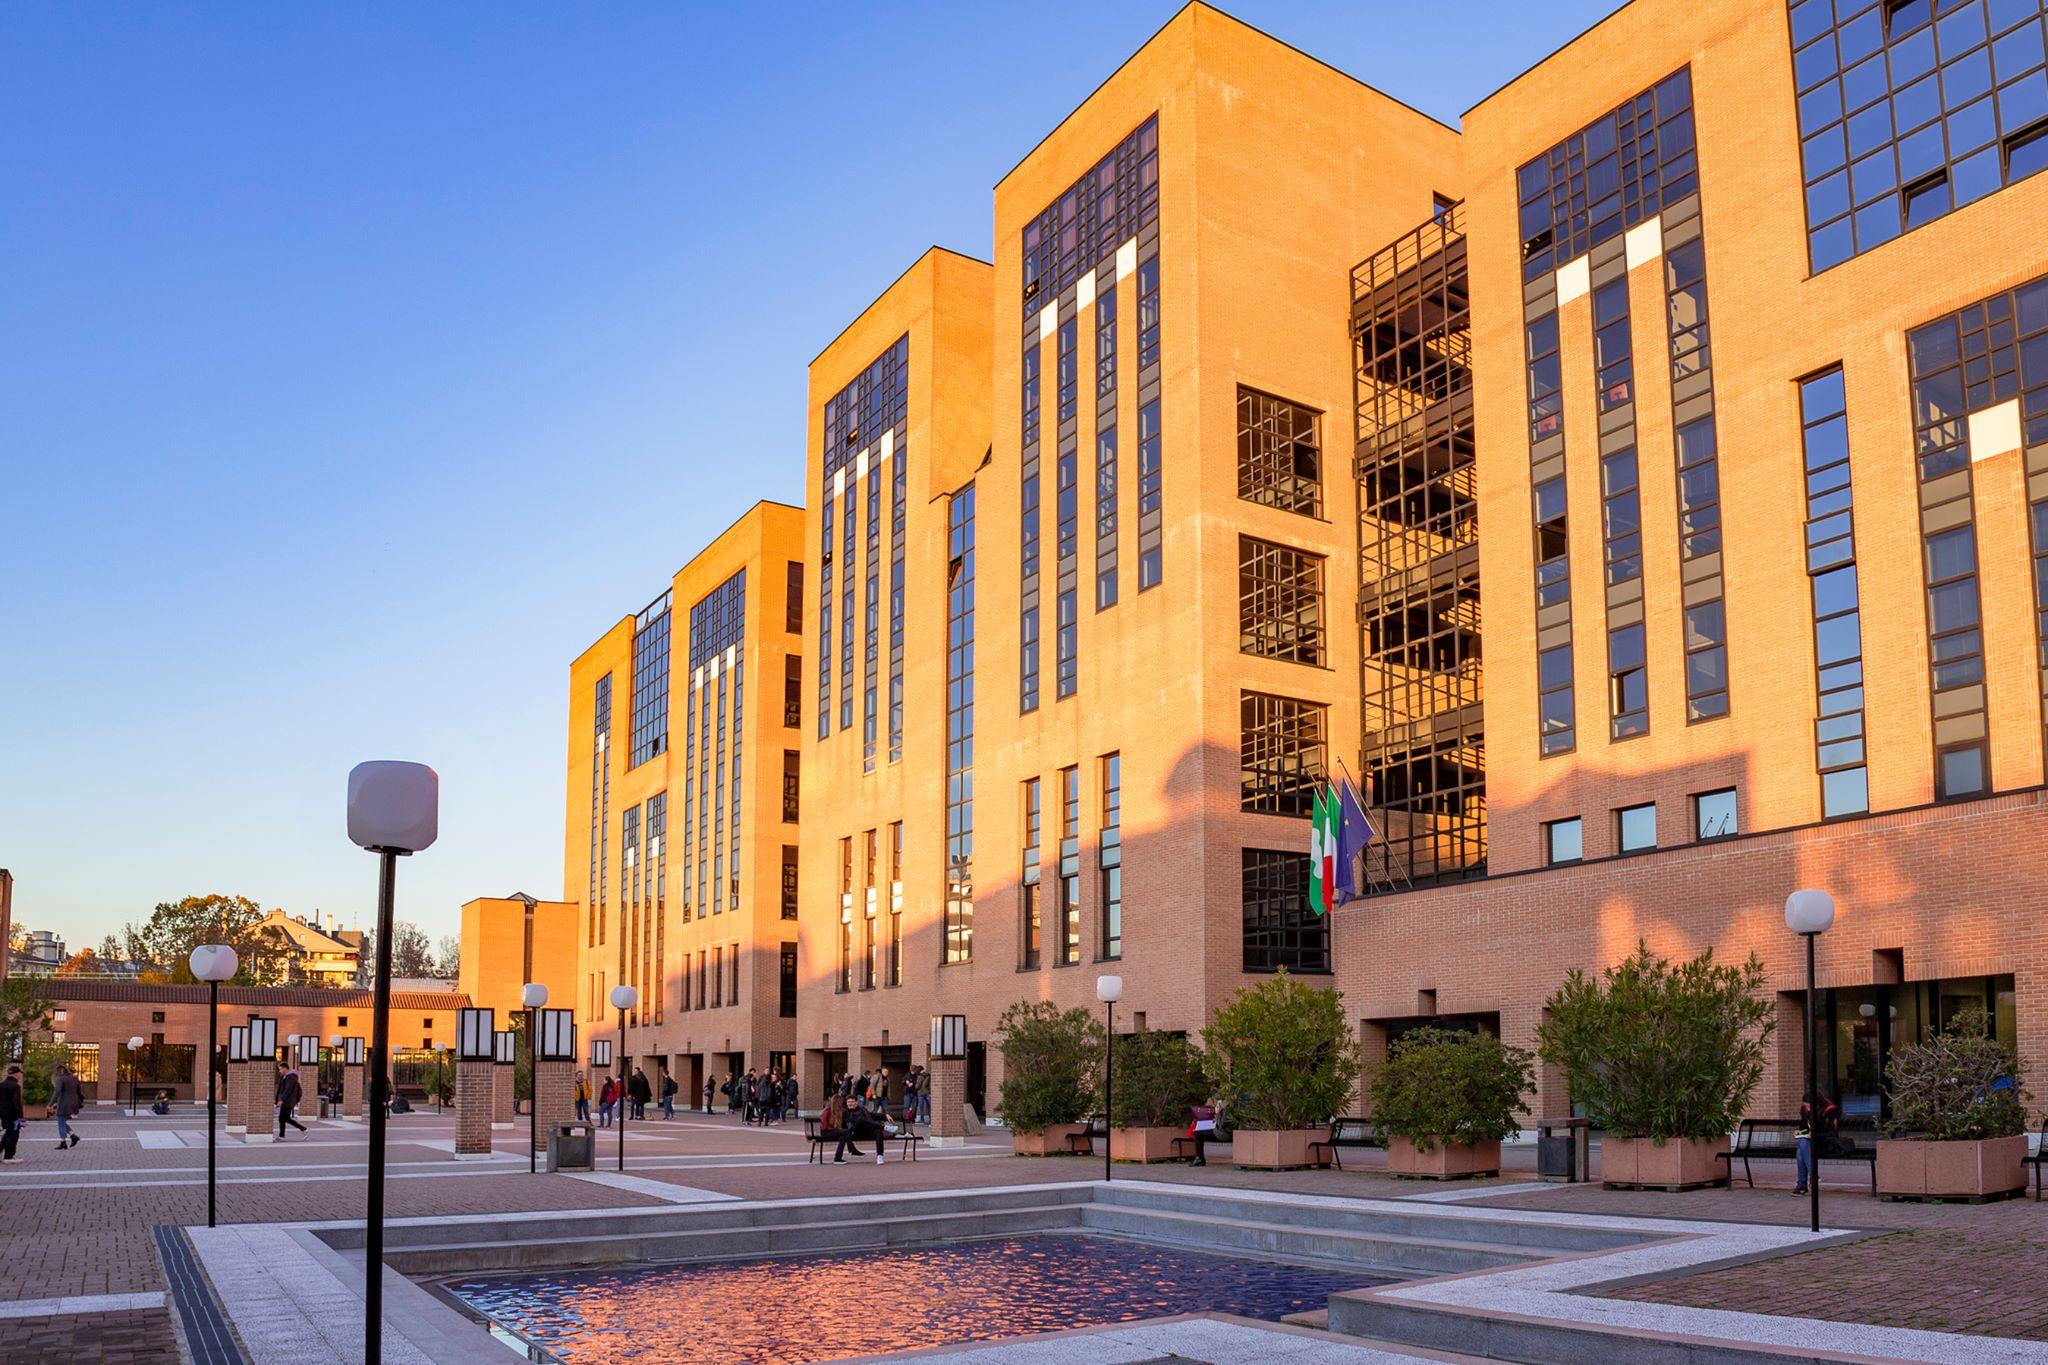 International University of Language and Media – IULM Campus